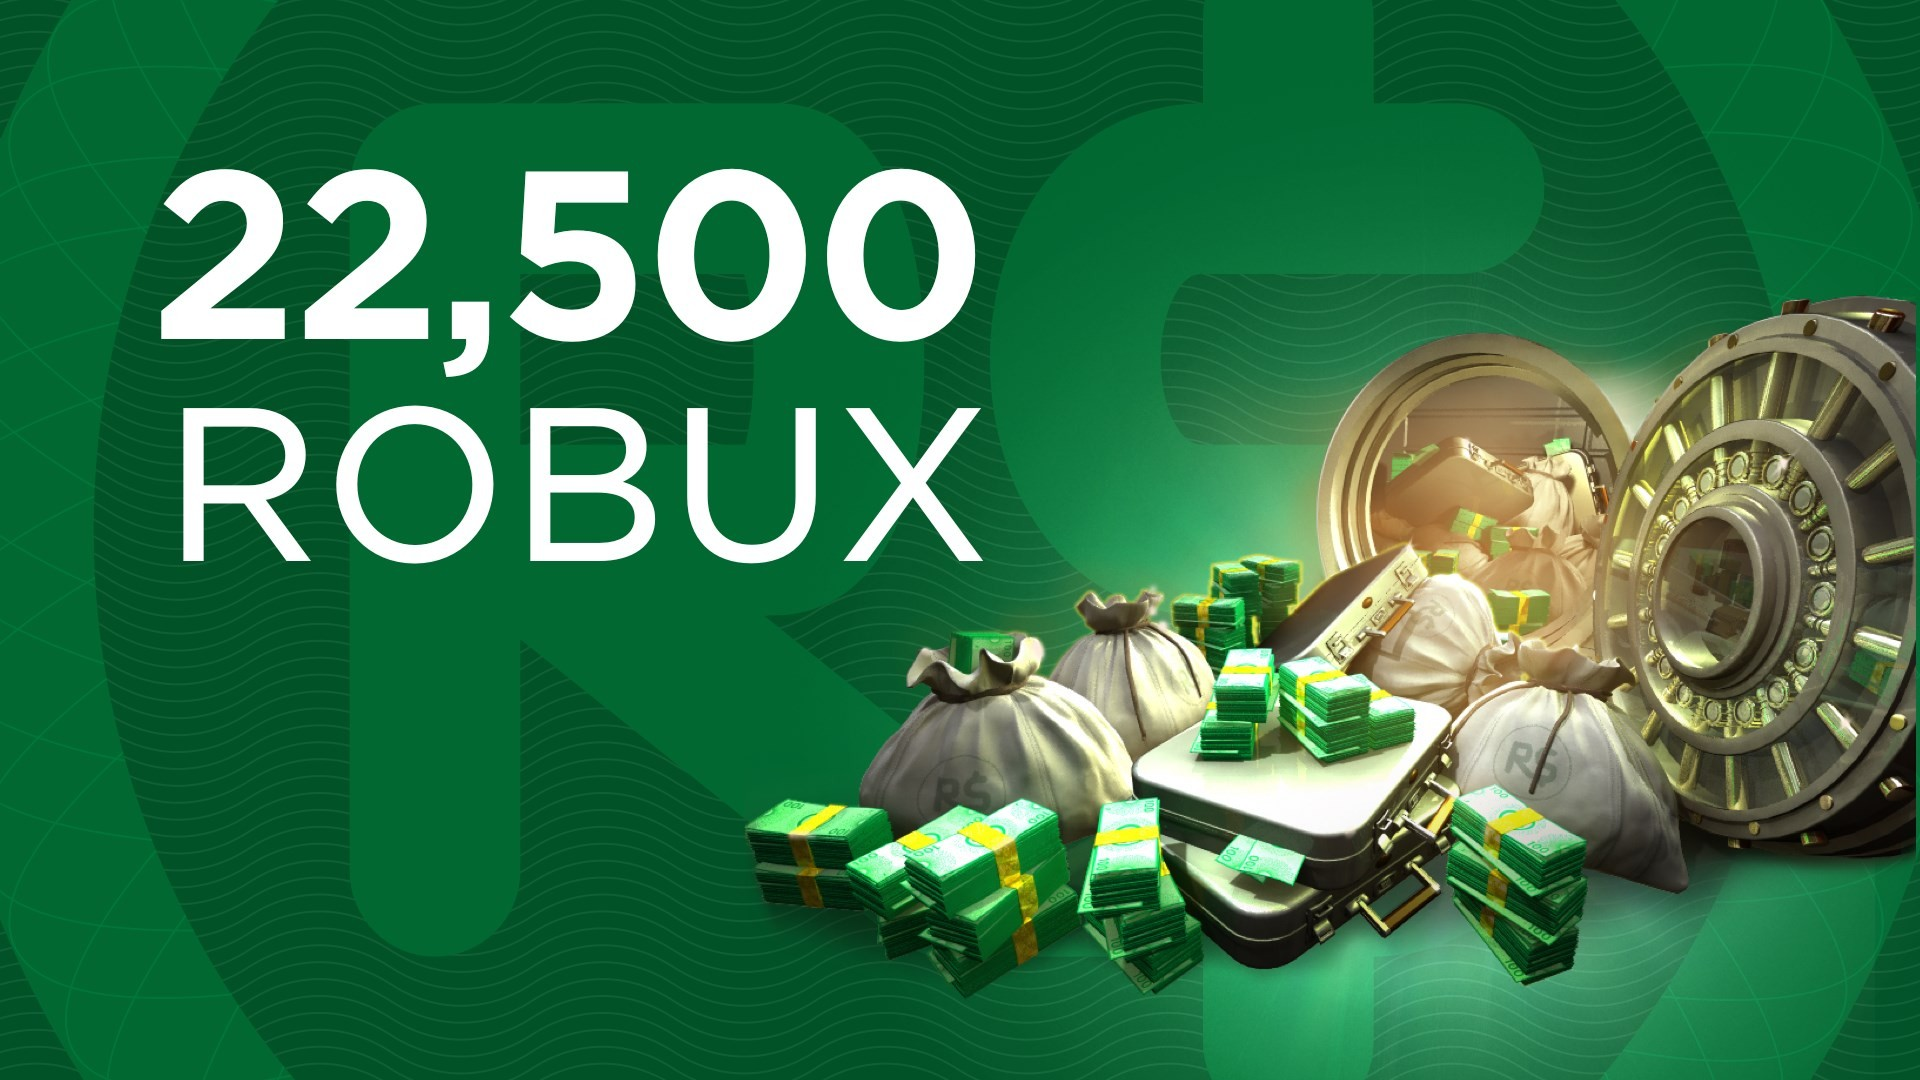 Free roblox robux codes 2019 ROBLOX HACK GENERATOR | LinkedIn